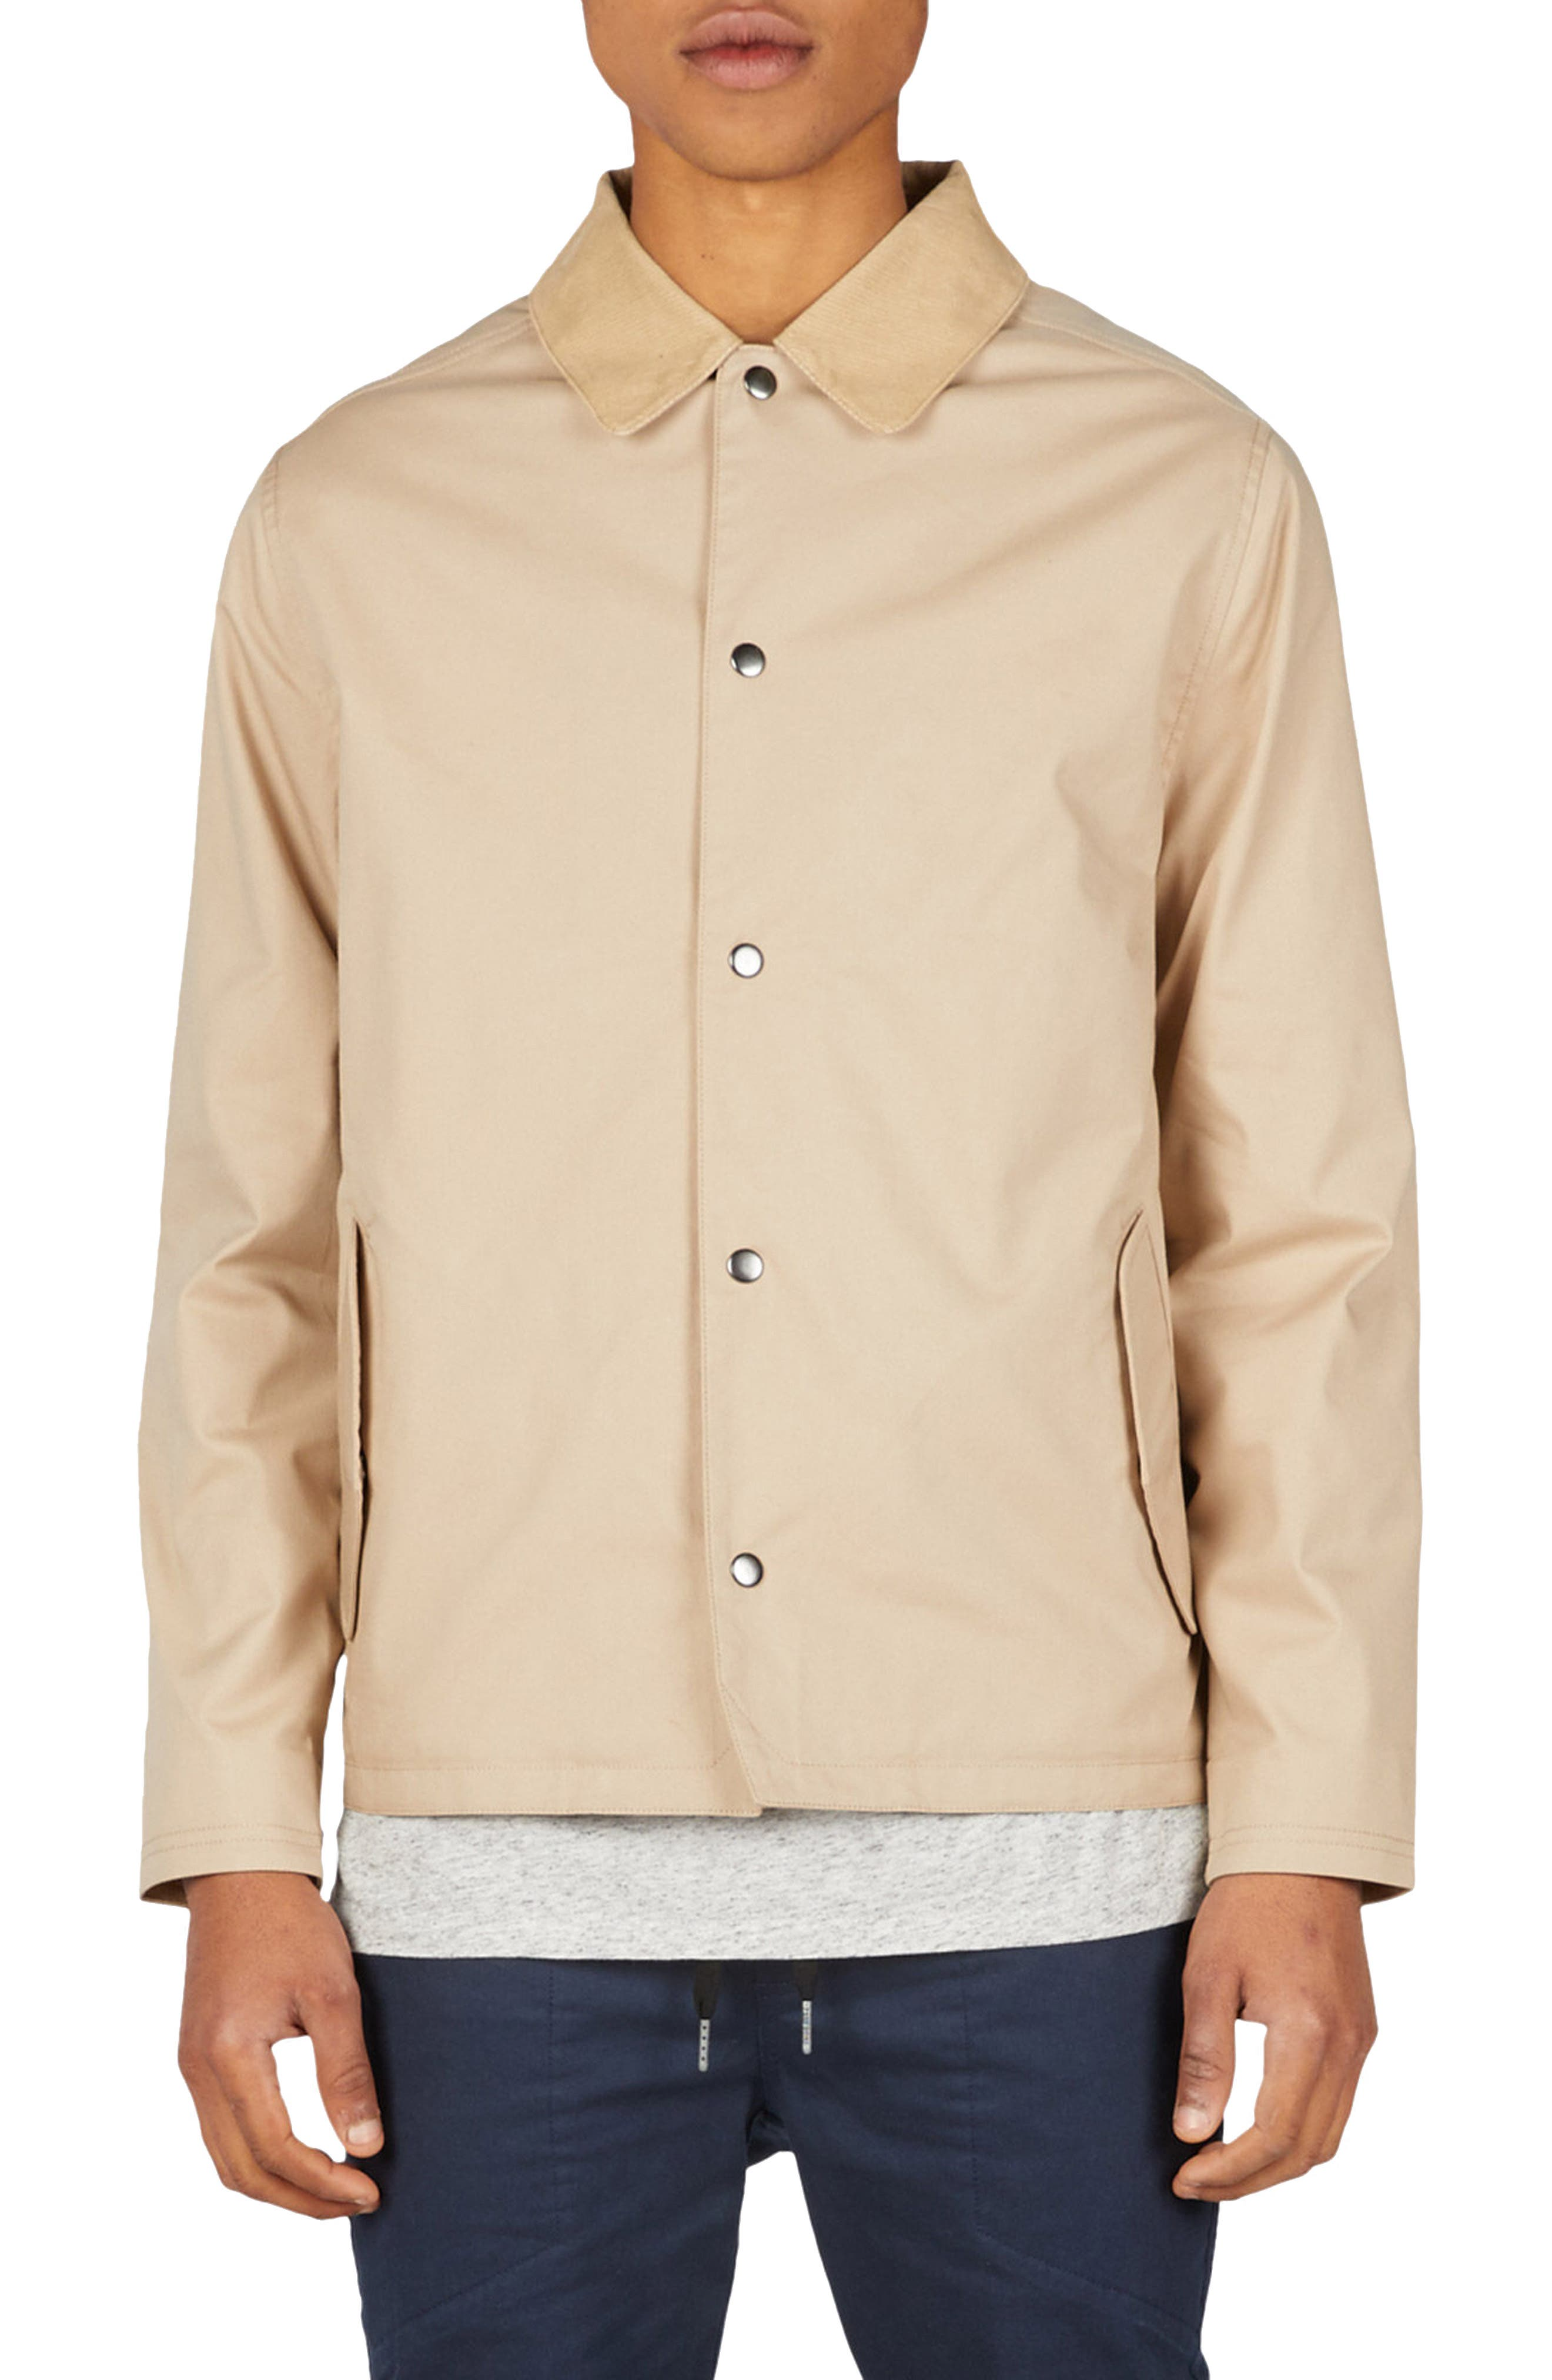 Coach's Jacket,                             Main thumbnail 1, color,                             901